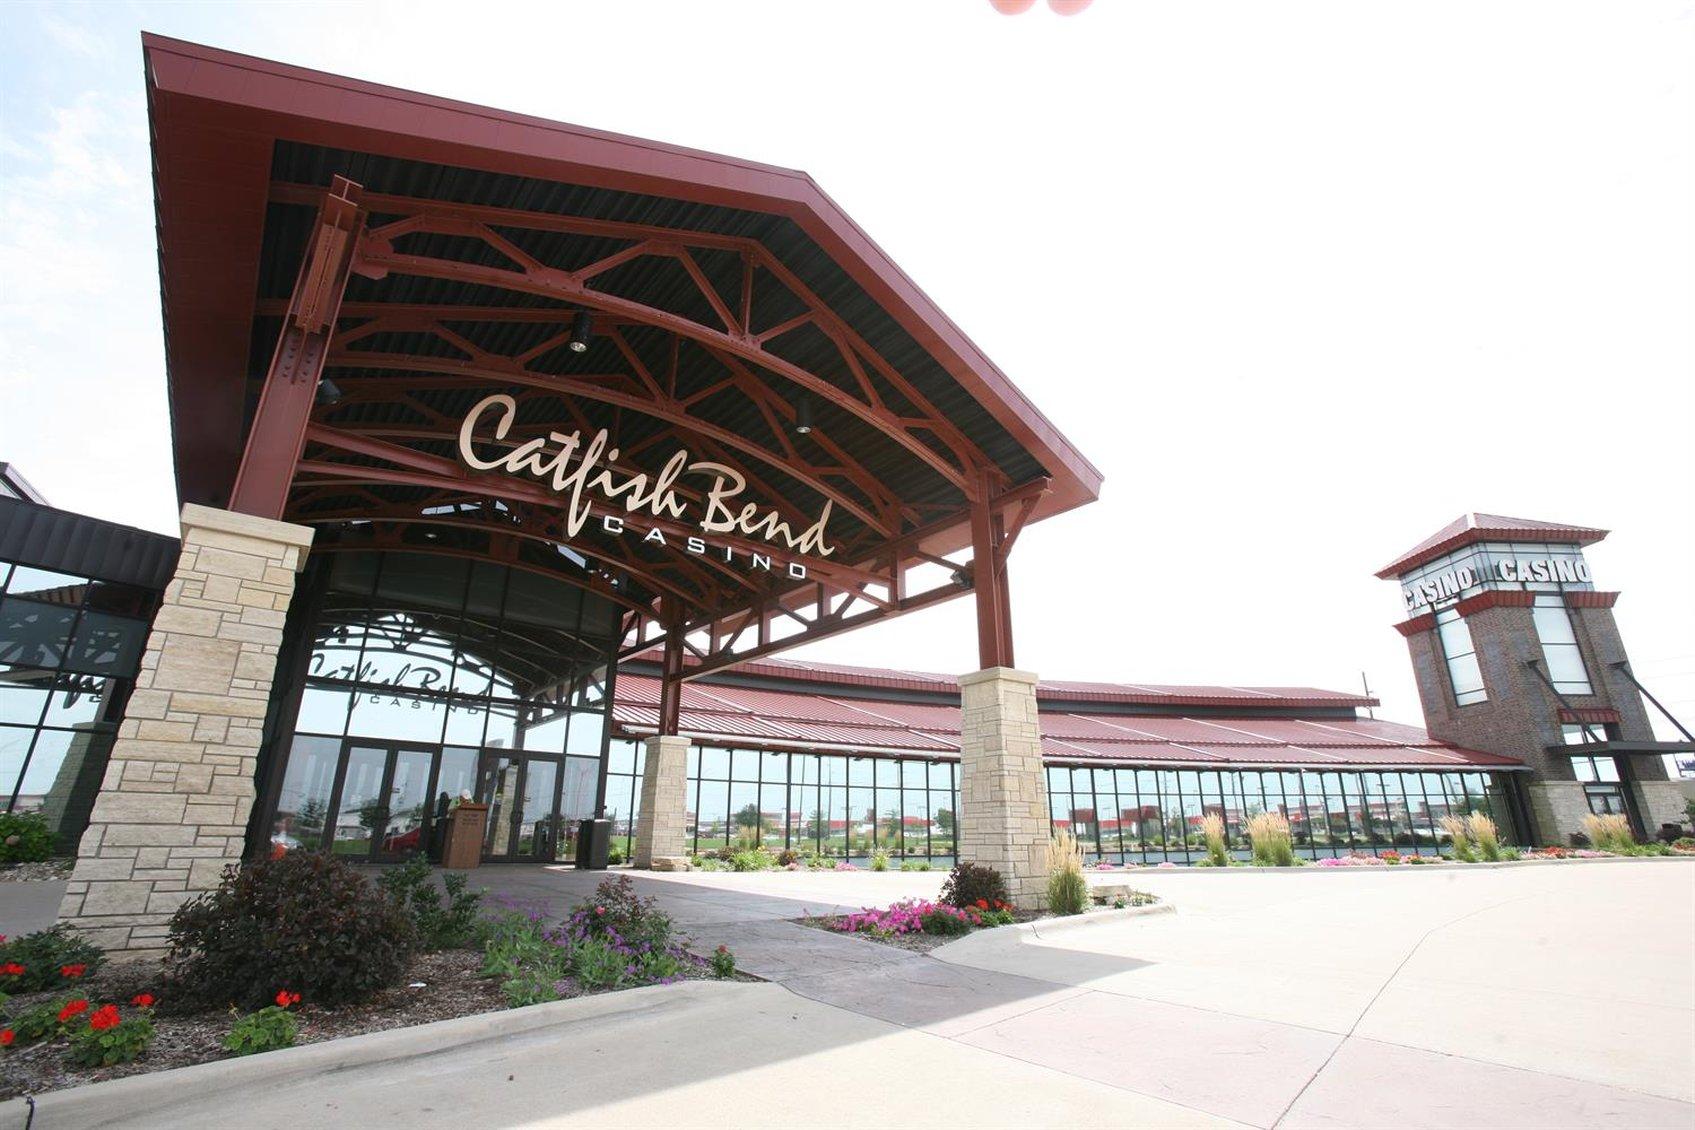 PZAZZ Resort Catfish Bend Inn and Spa